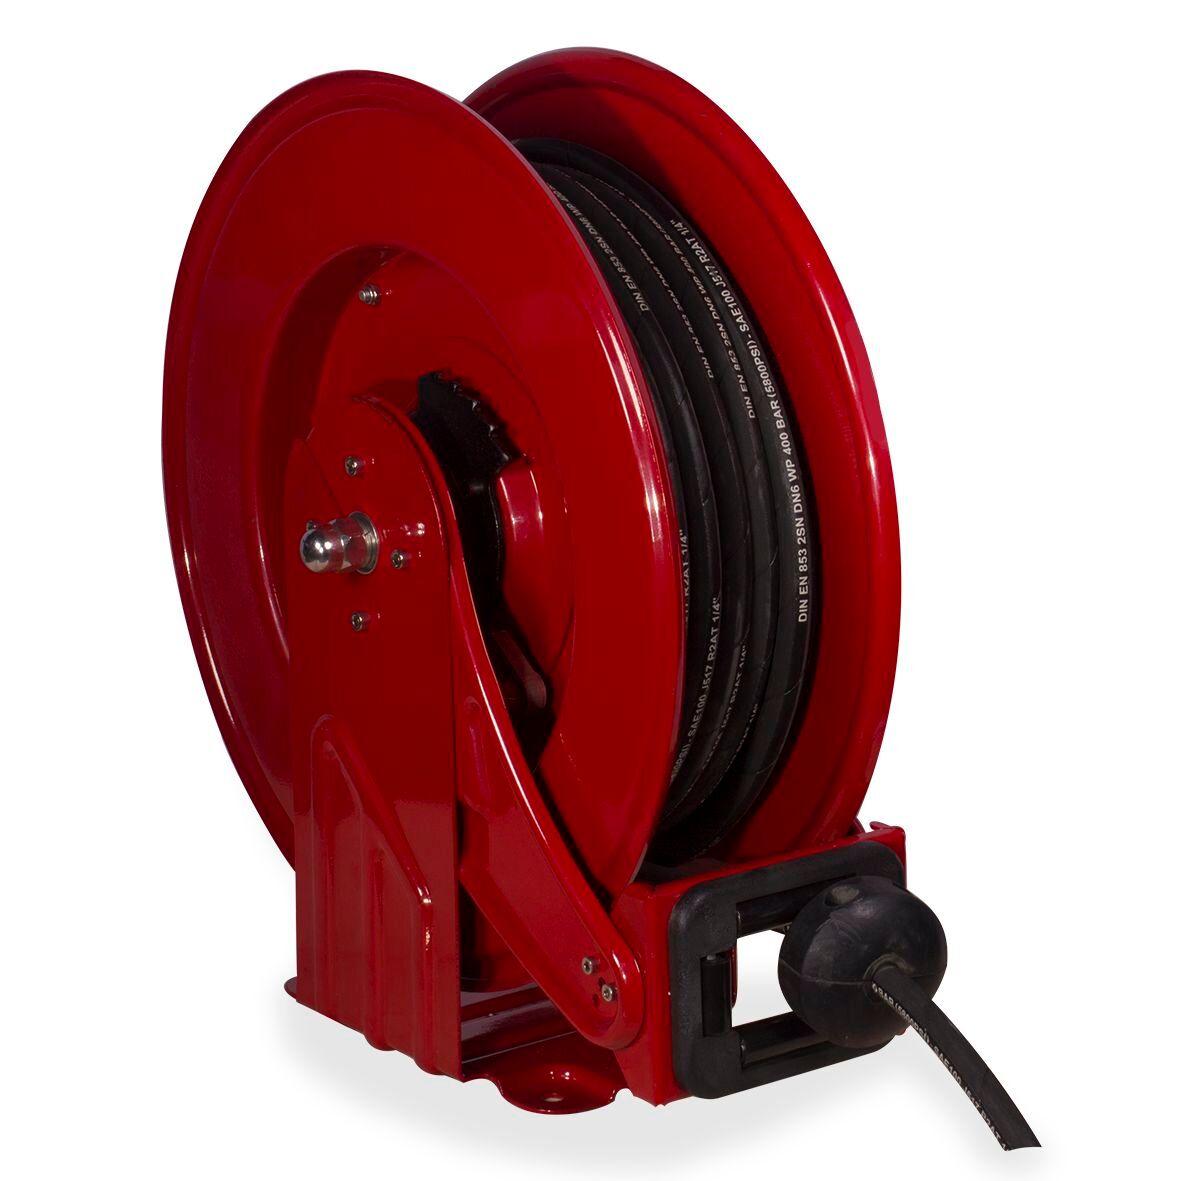 Mw-tools Enrouleur graisse 15 m - 3/8 MW-Tools SHV3815